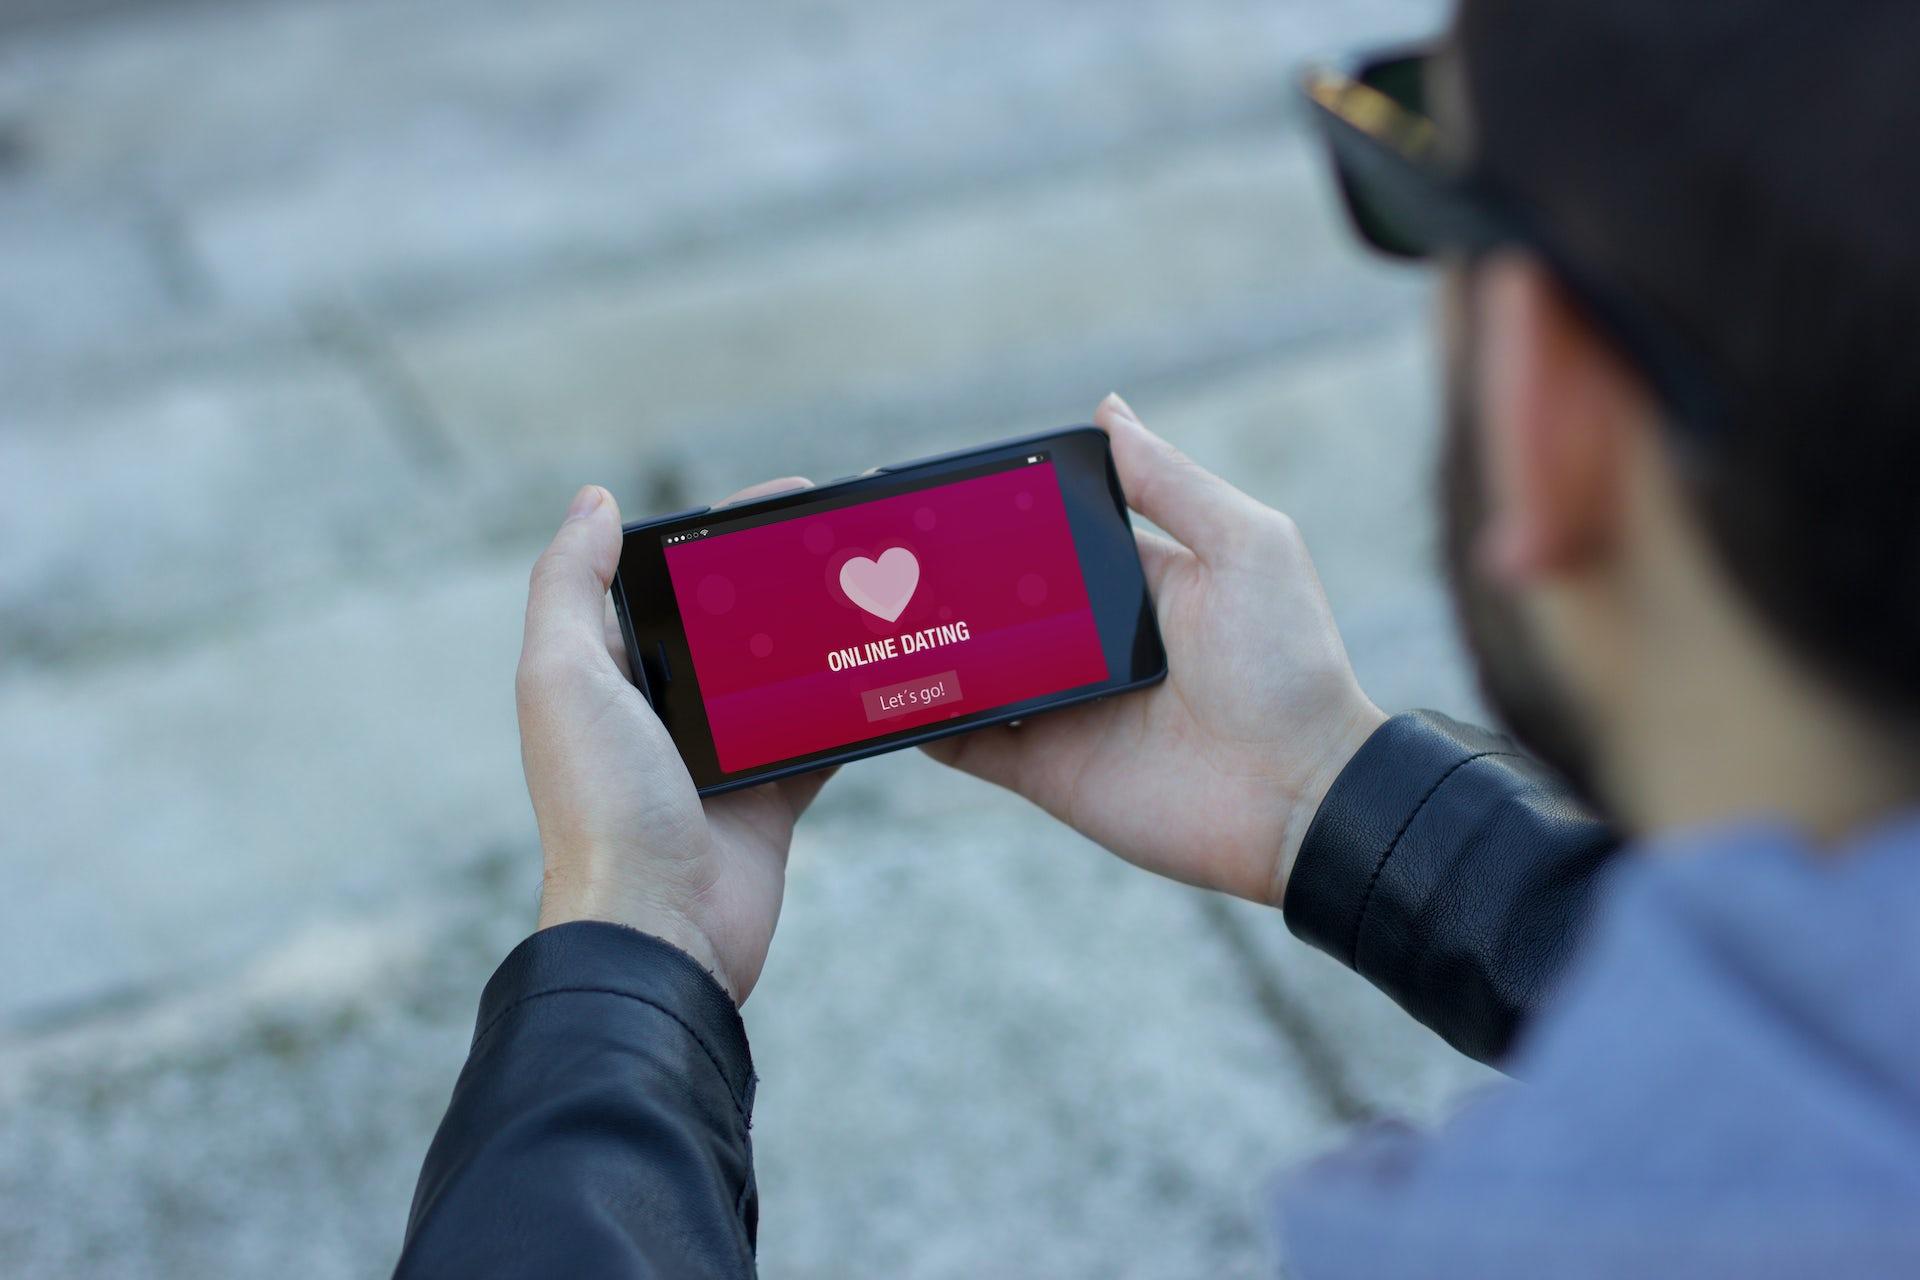 Online dating causes divorce